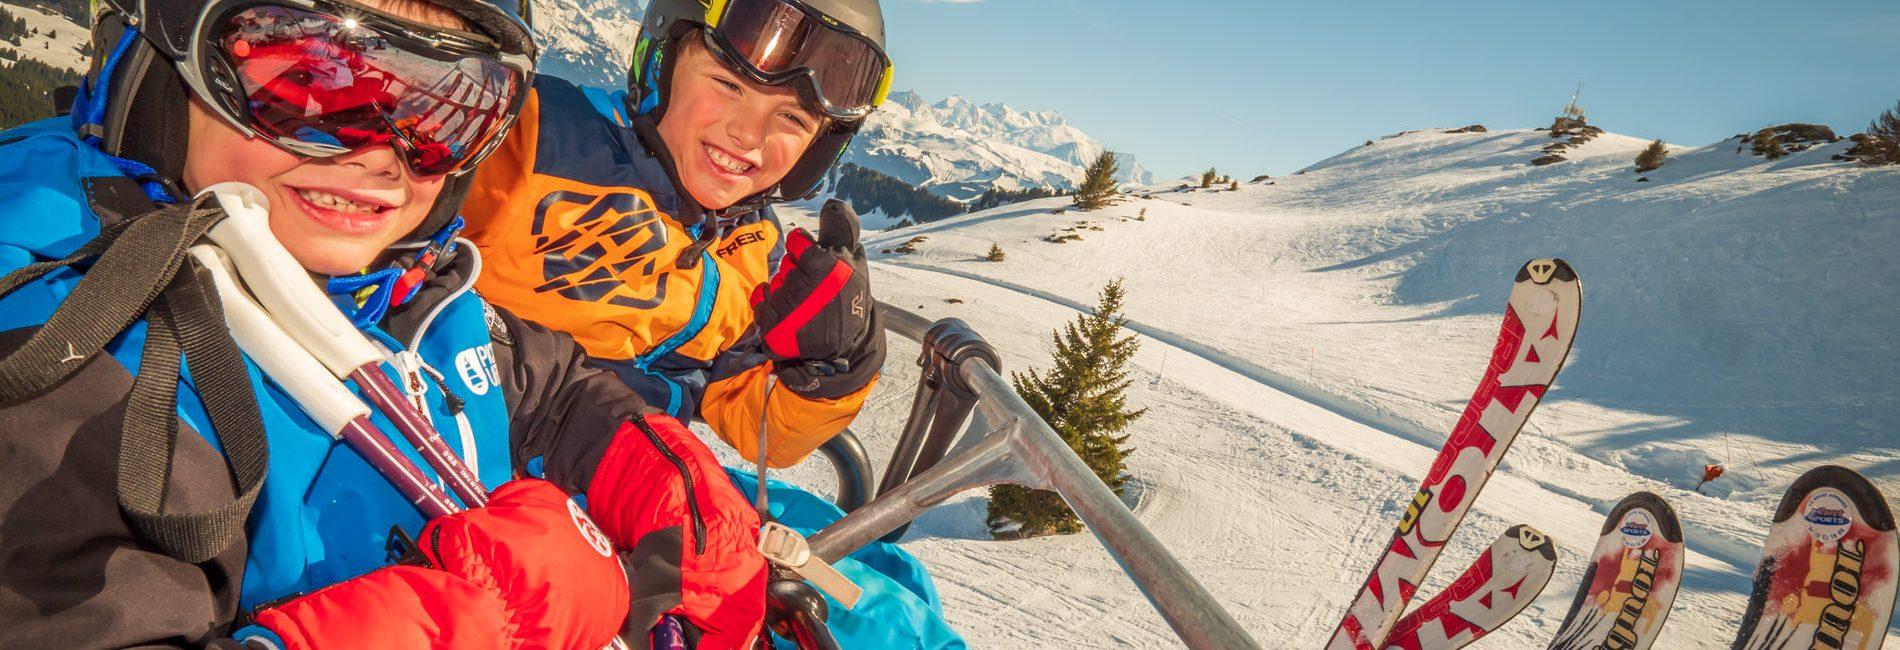 02703 20 Praz Ski de Piste ©Gilles Piel